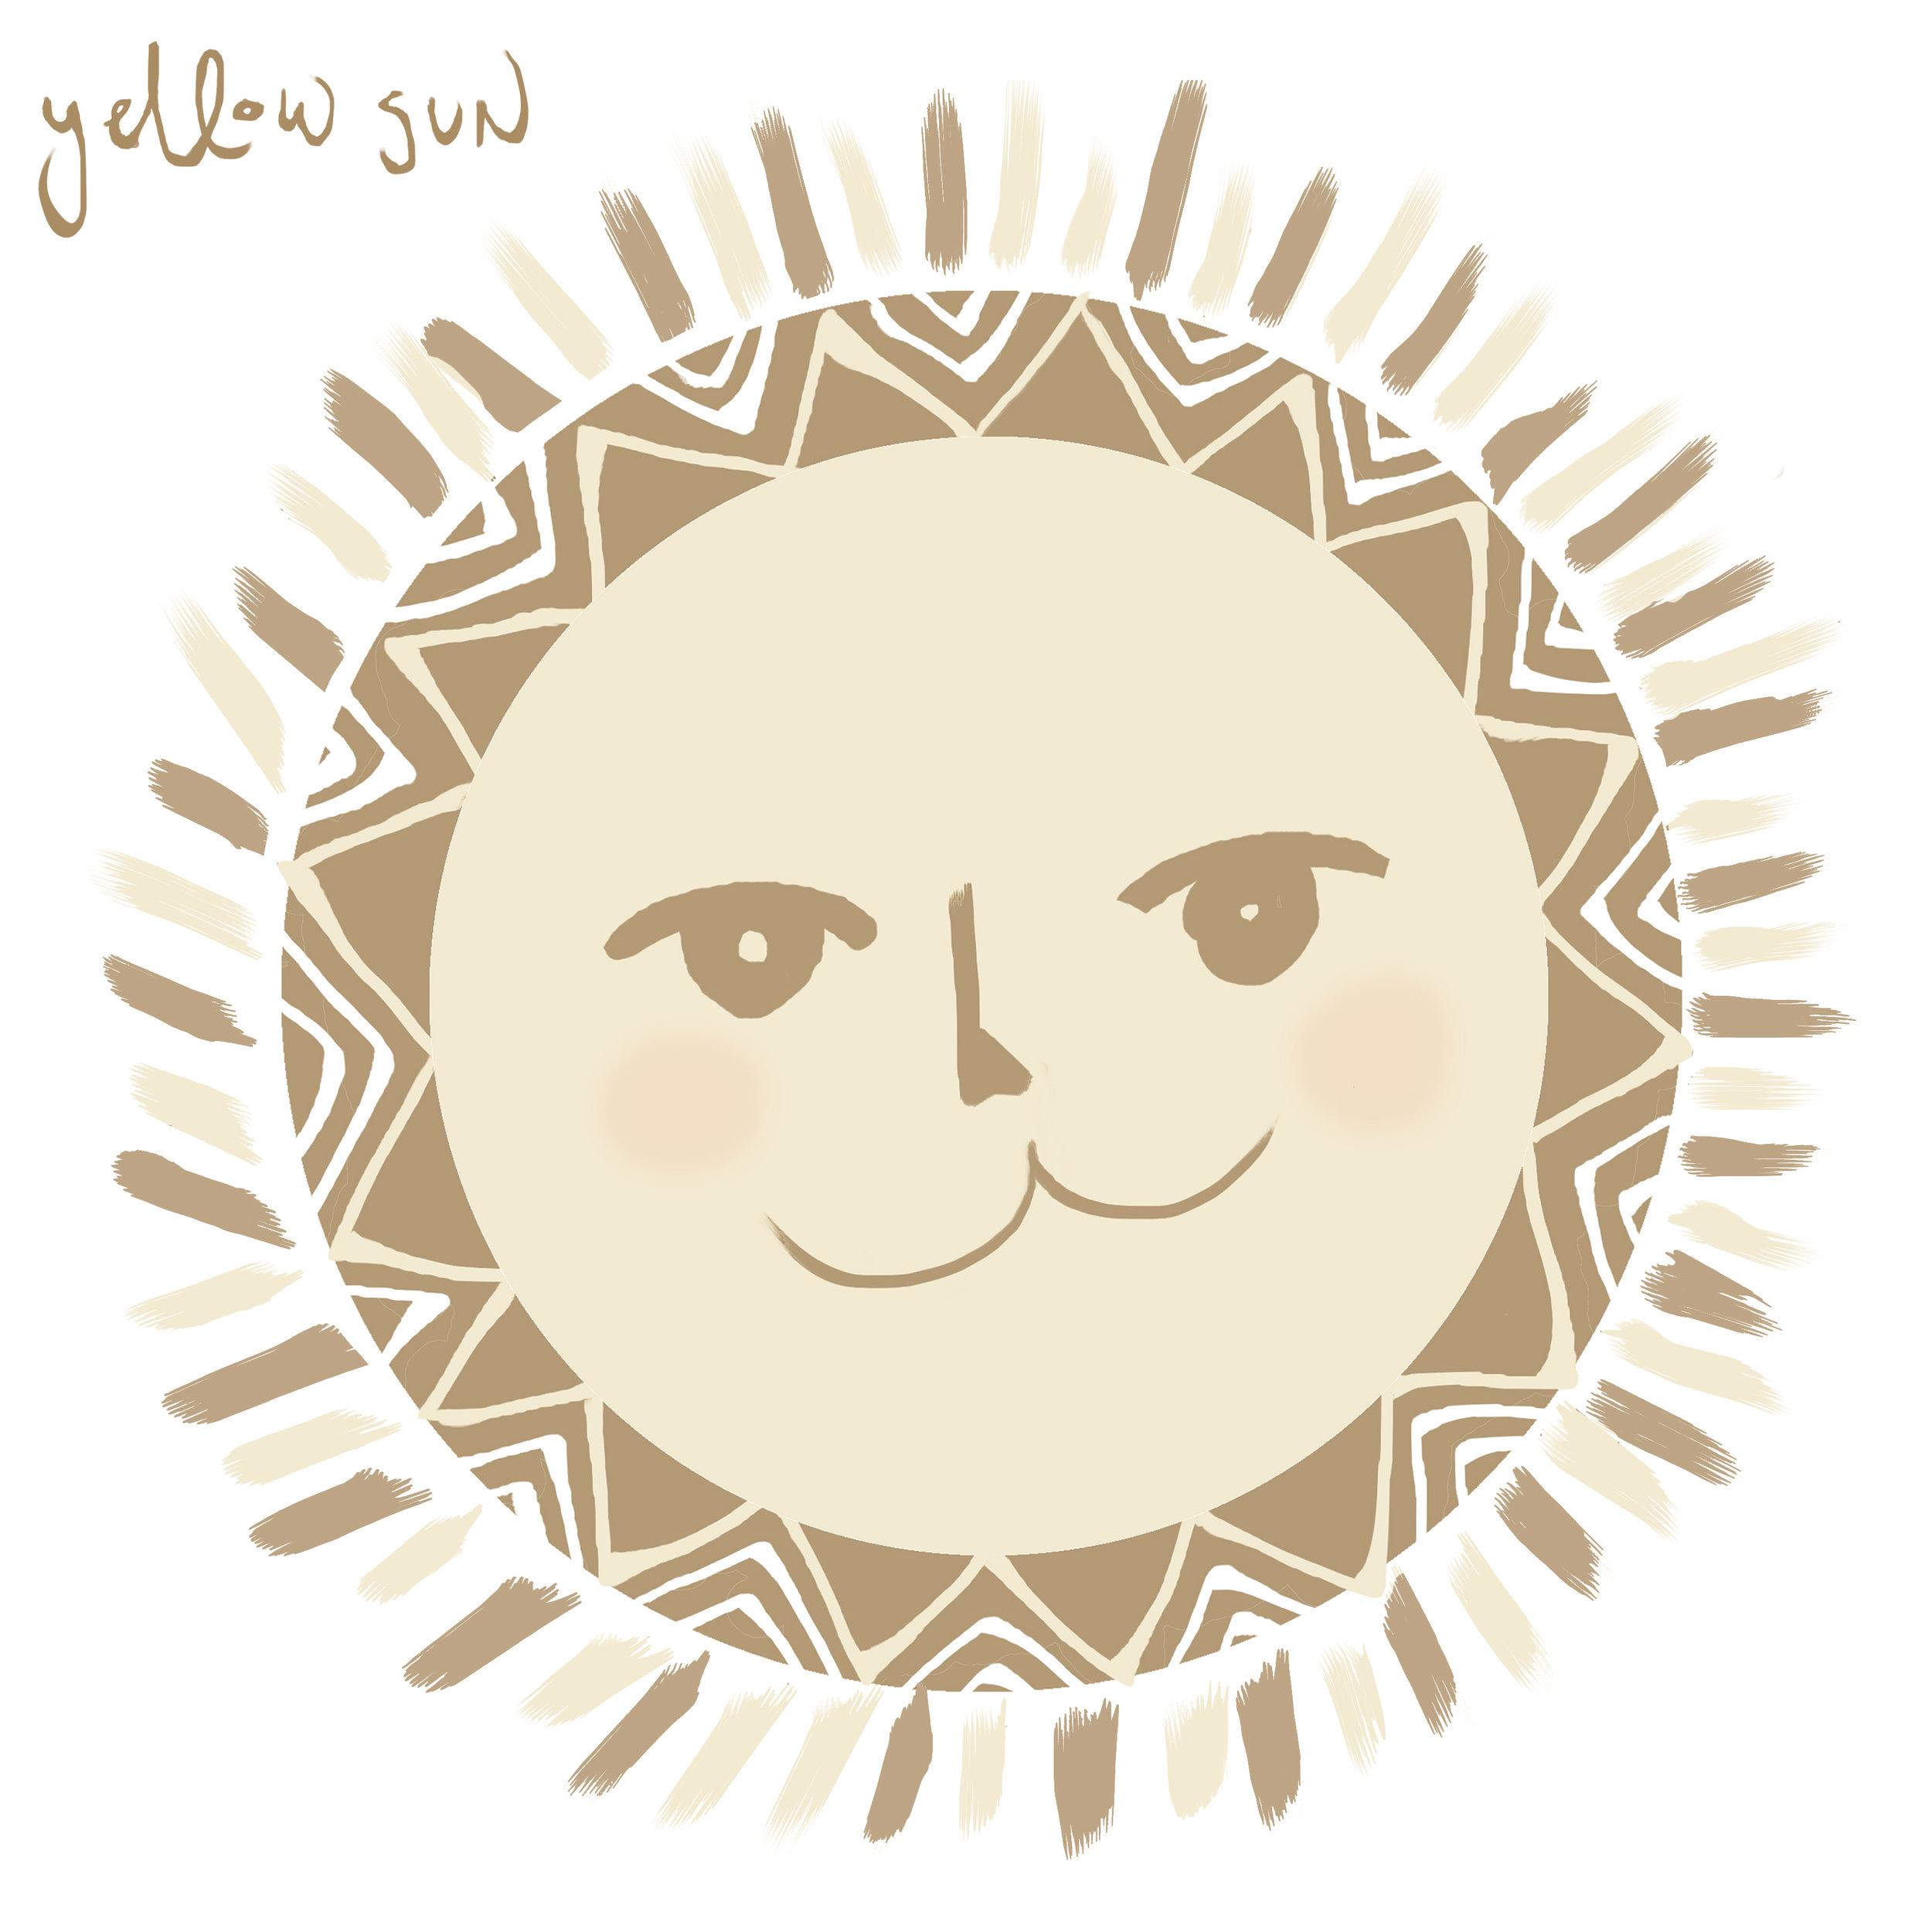 andysixstring yellow sun single